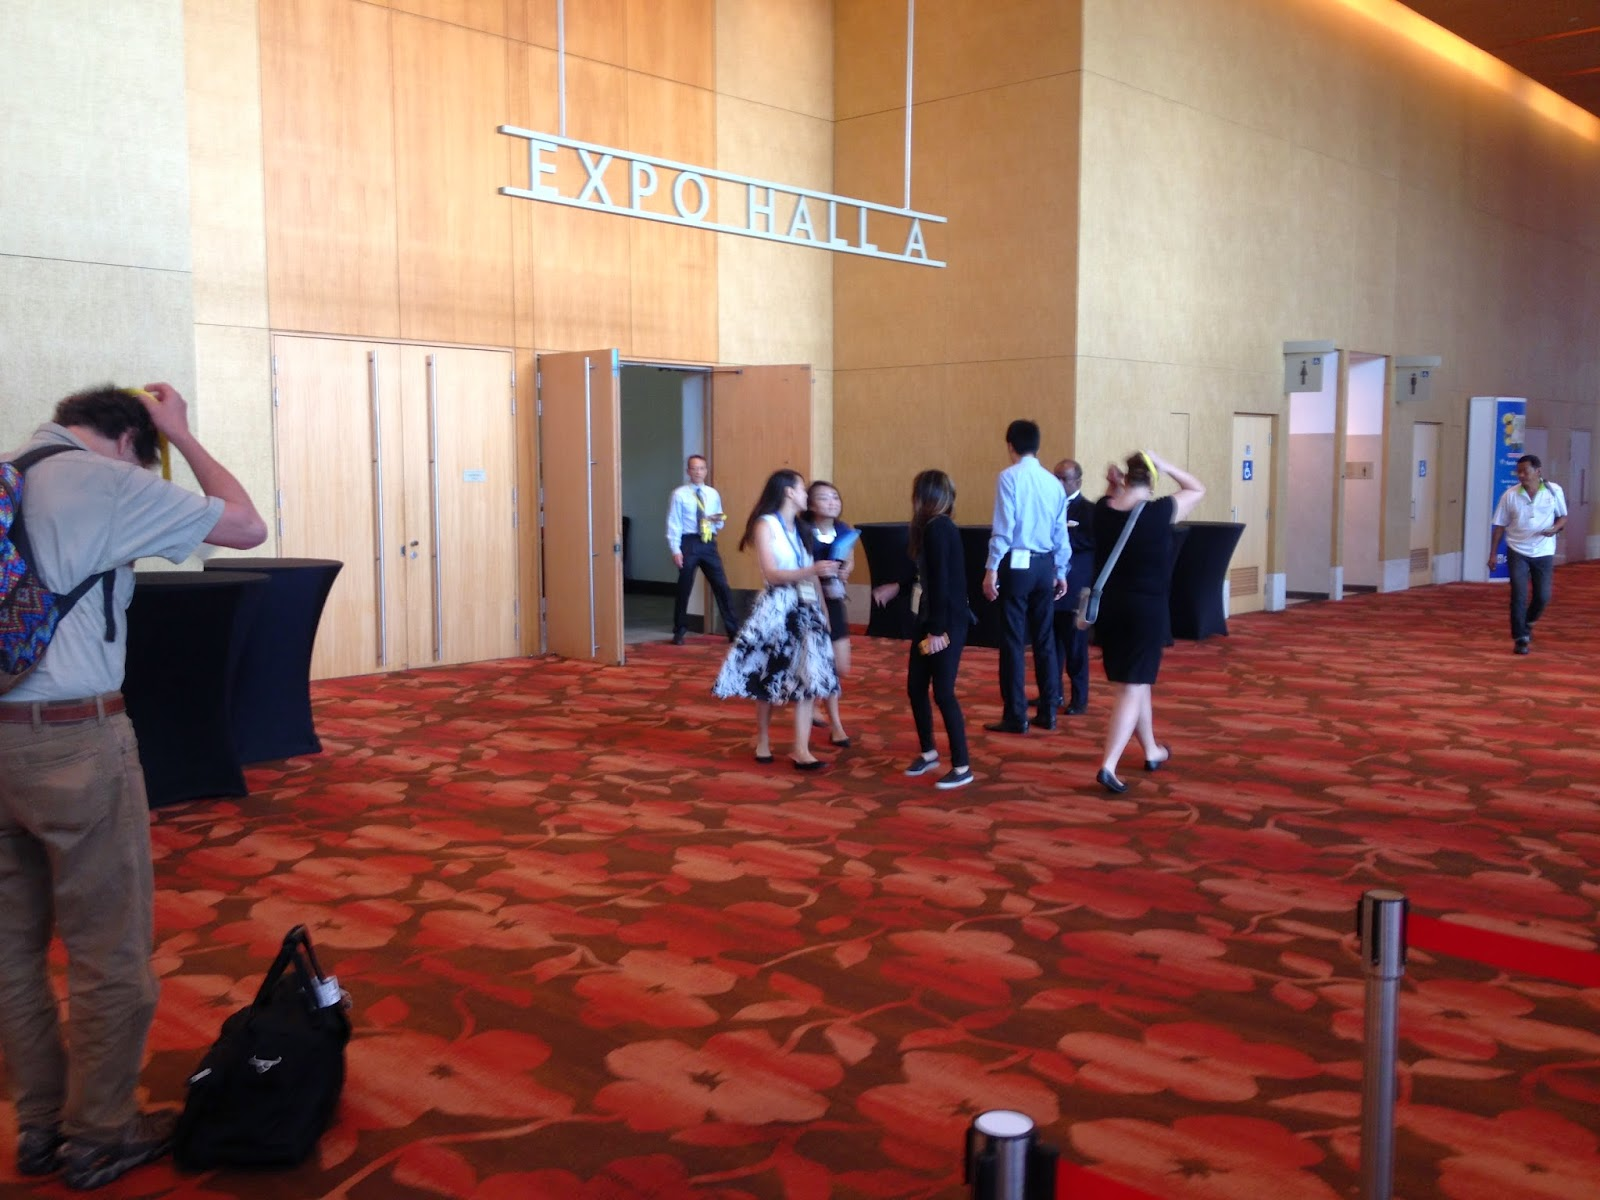 Marina Bay Sands Expo Center  - Hall A Entrance